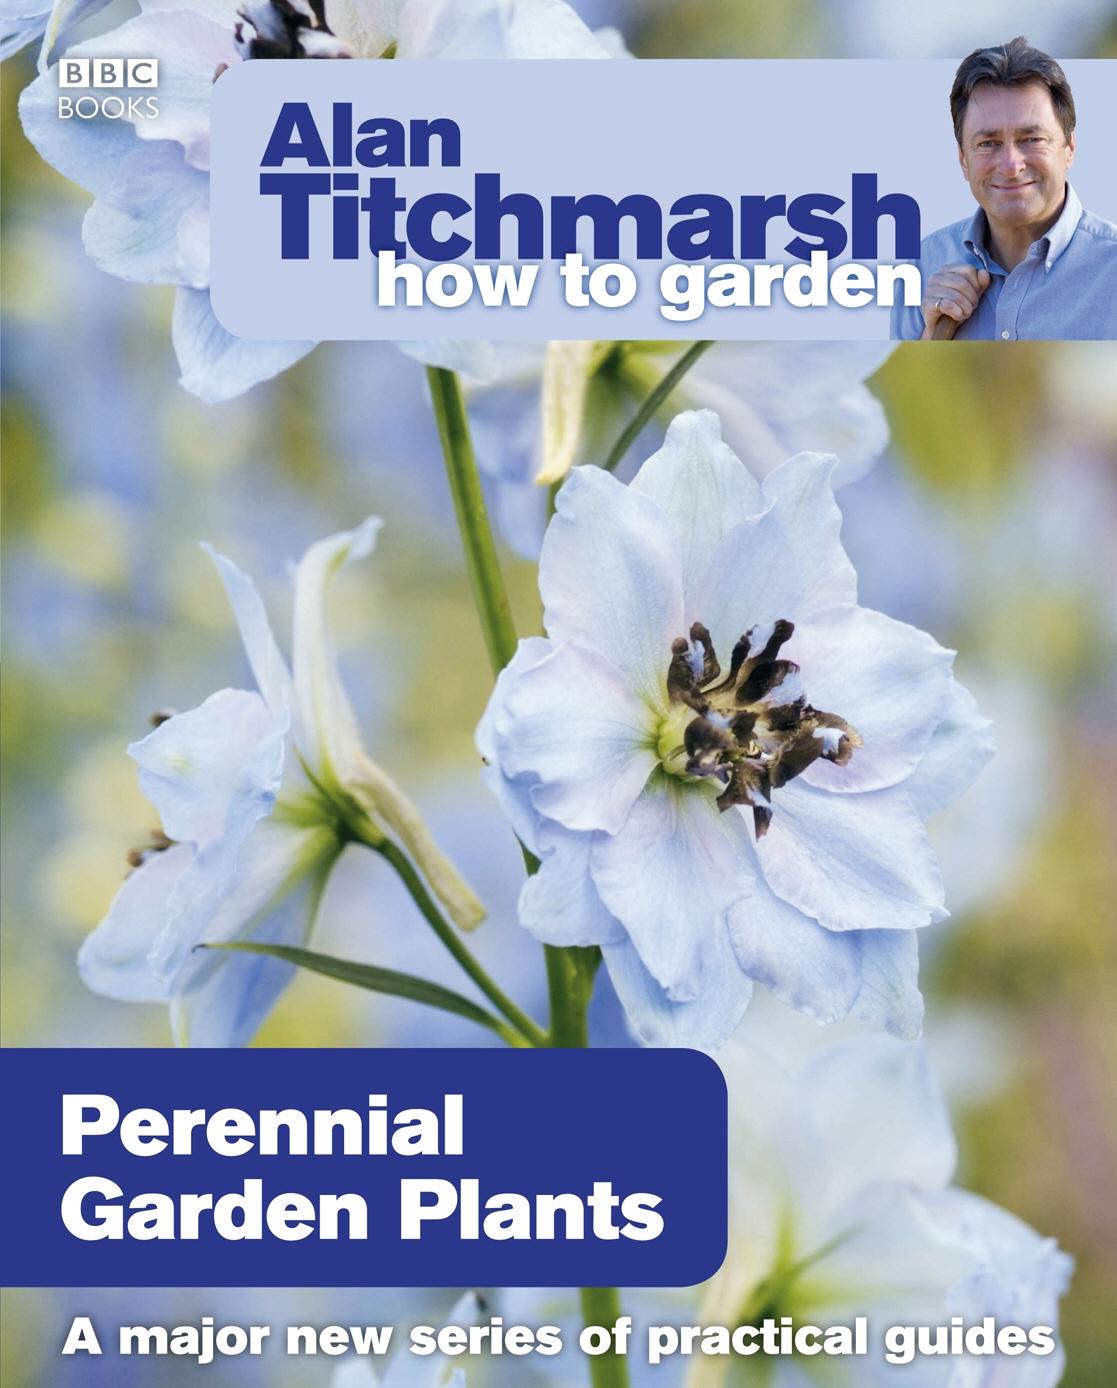 Alan Titchmarsh How to Garden Perennial Garden Plants by Alan